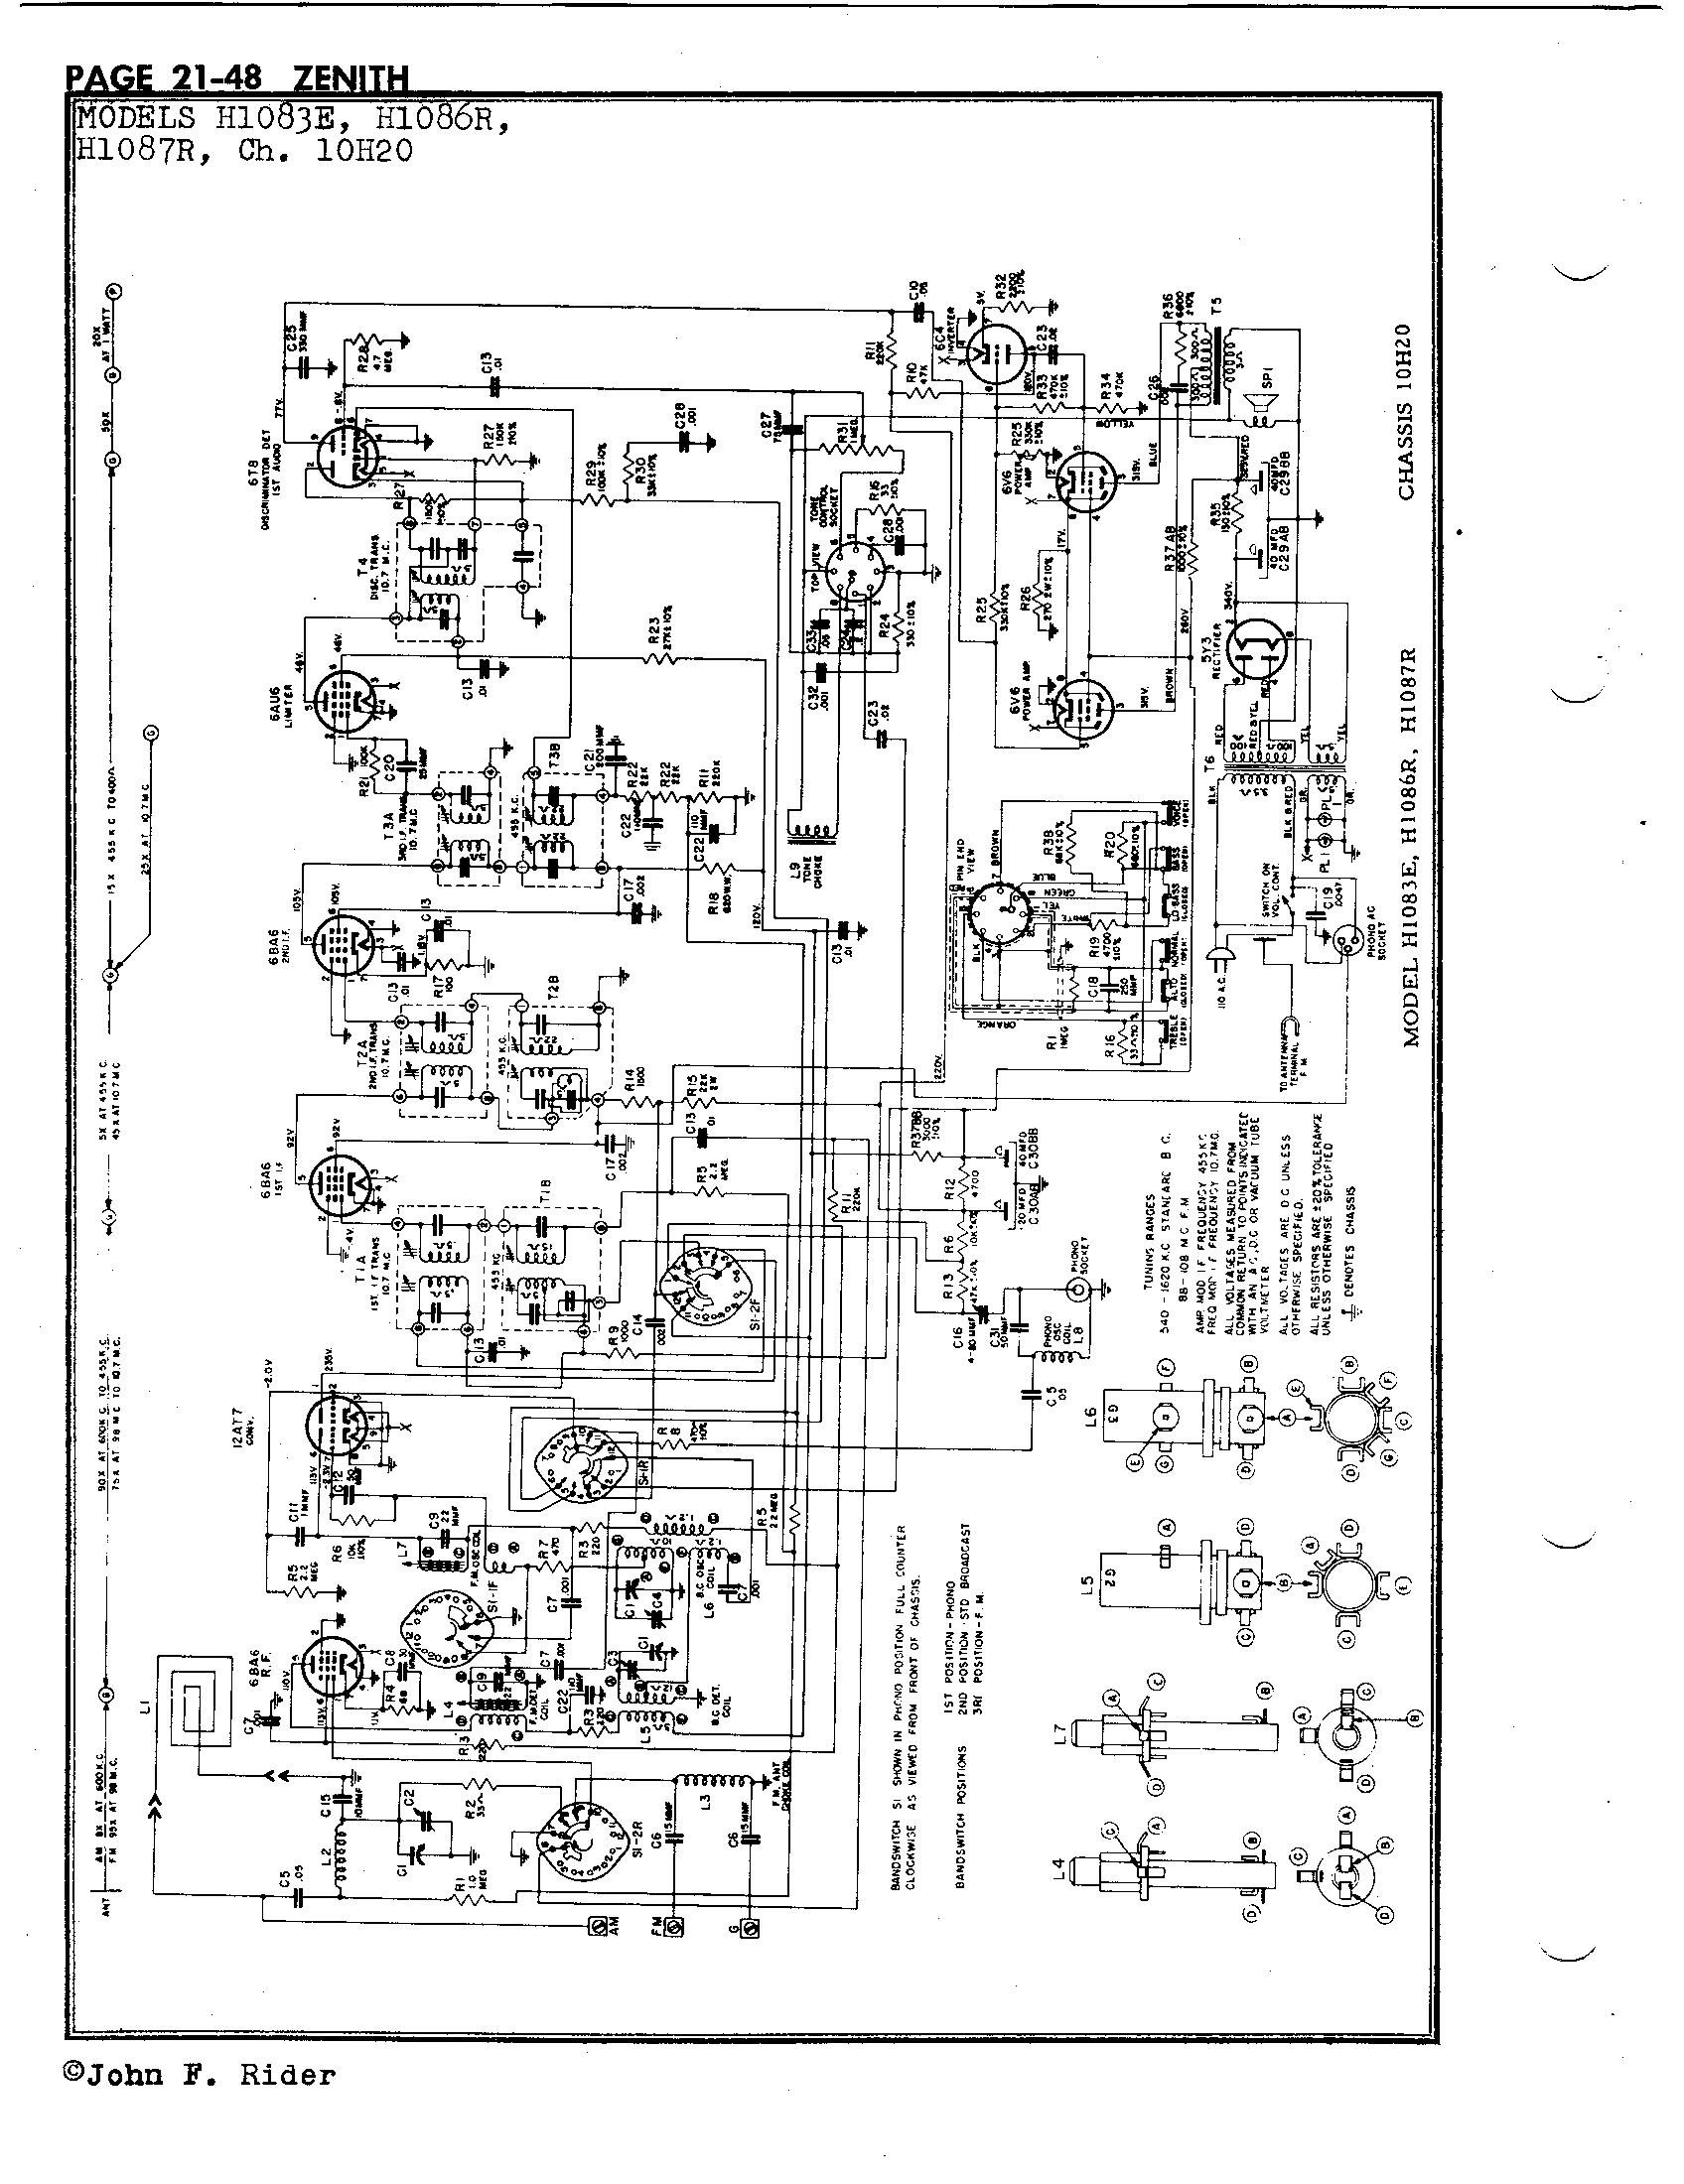 zenith radio corp  h1086r